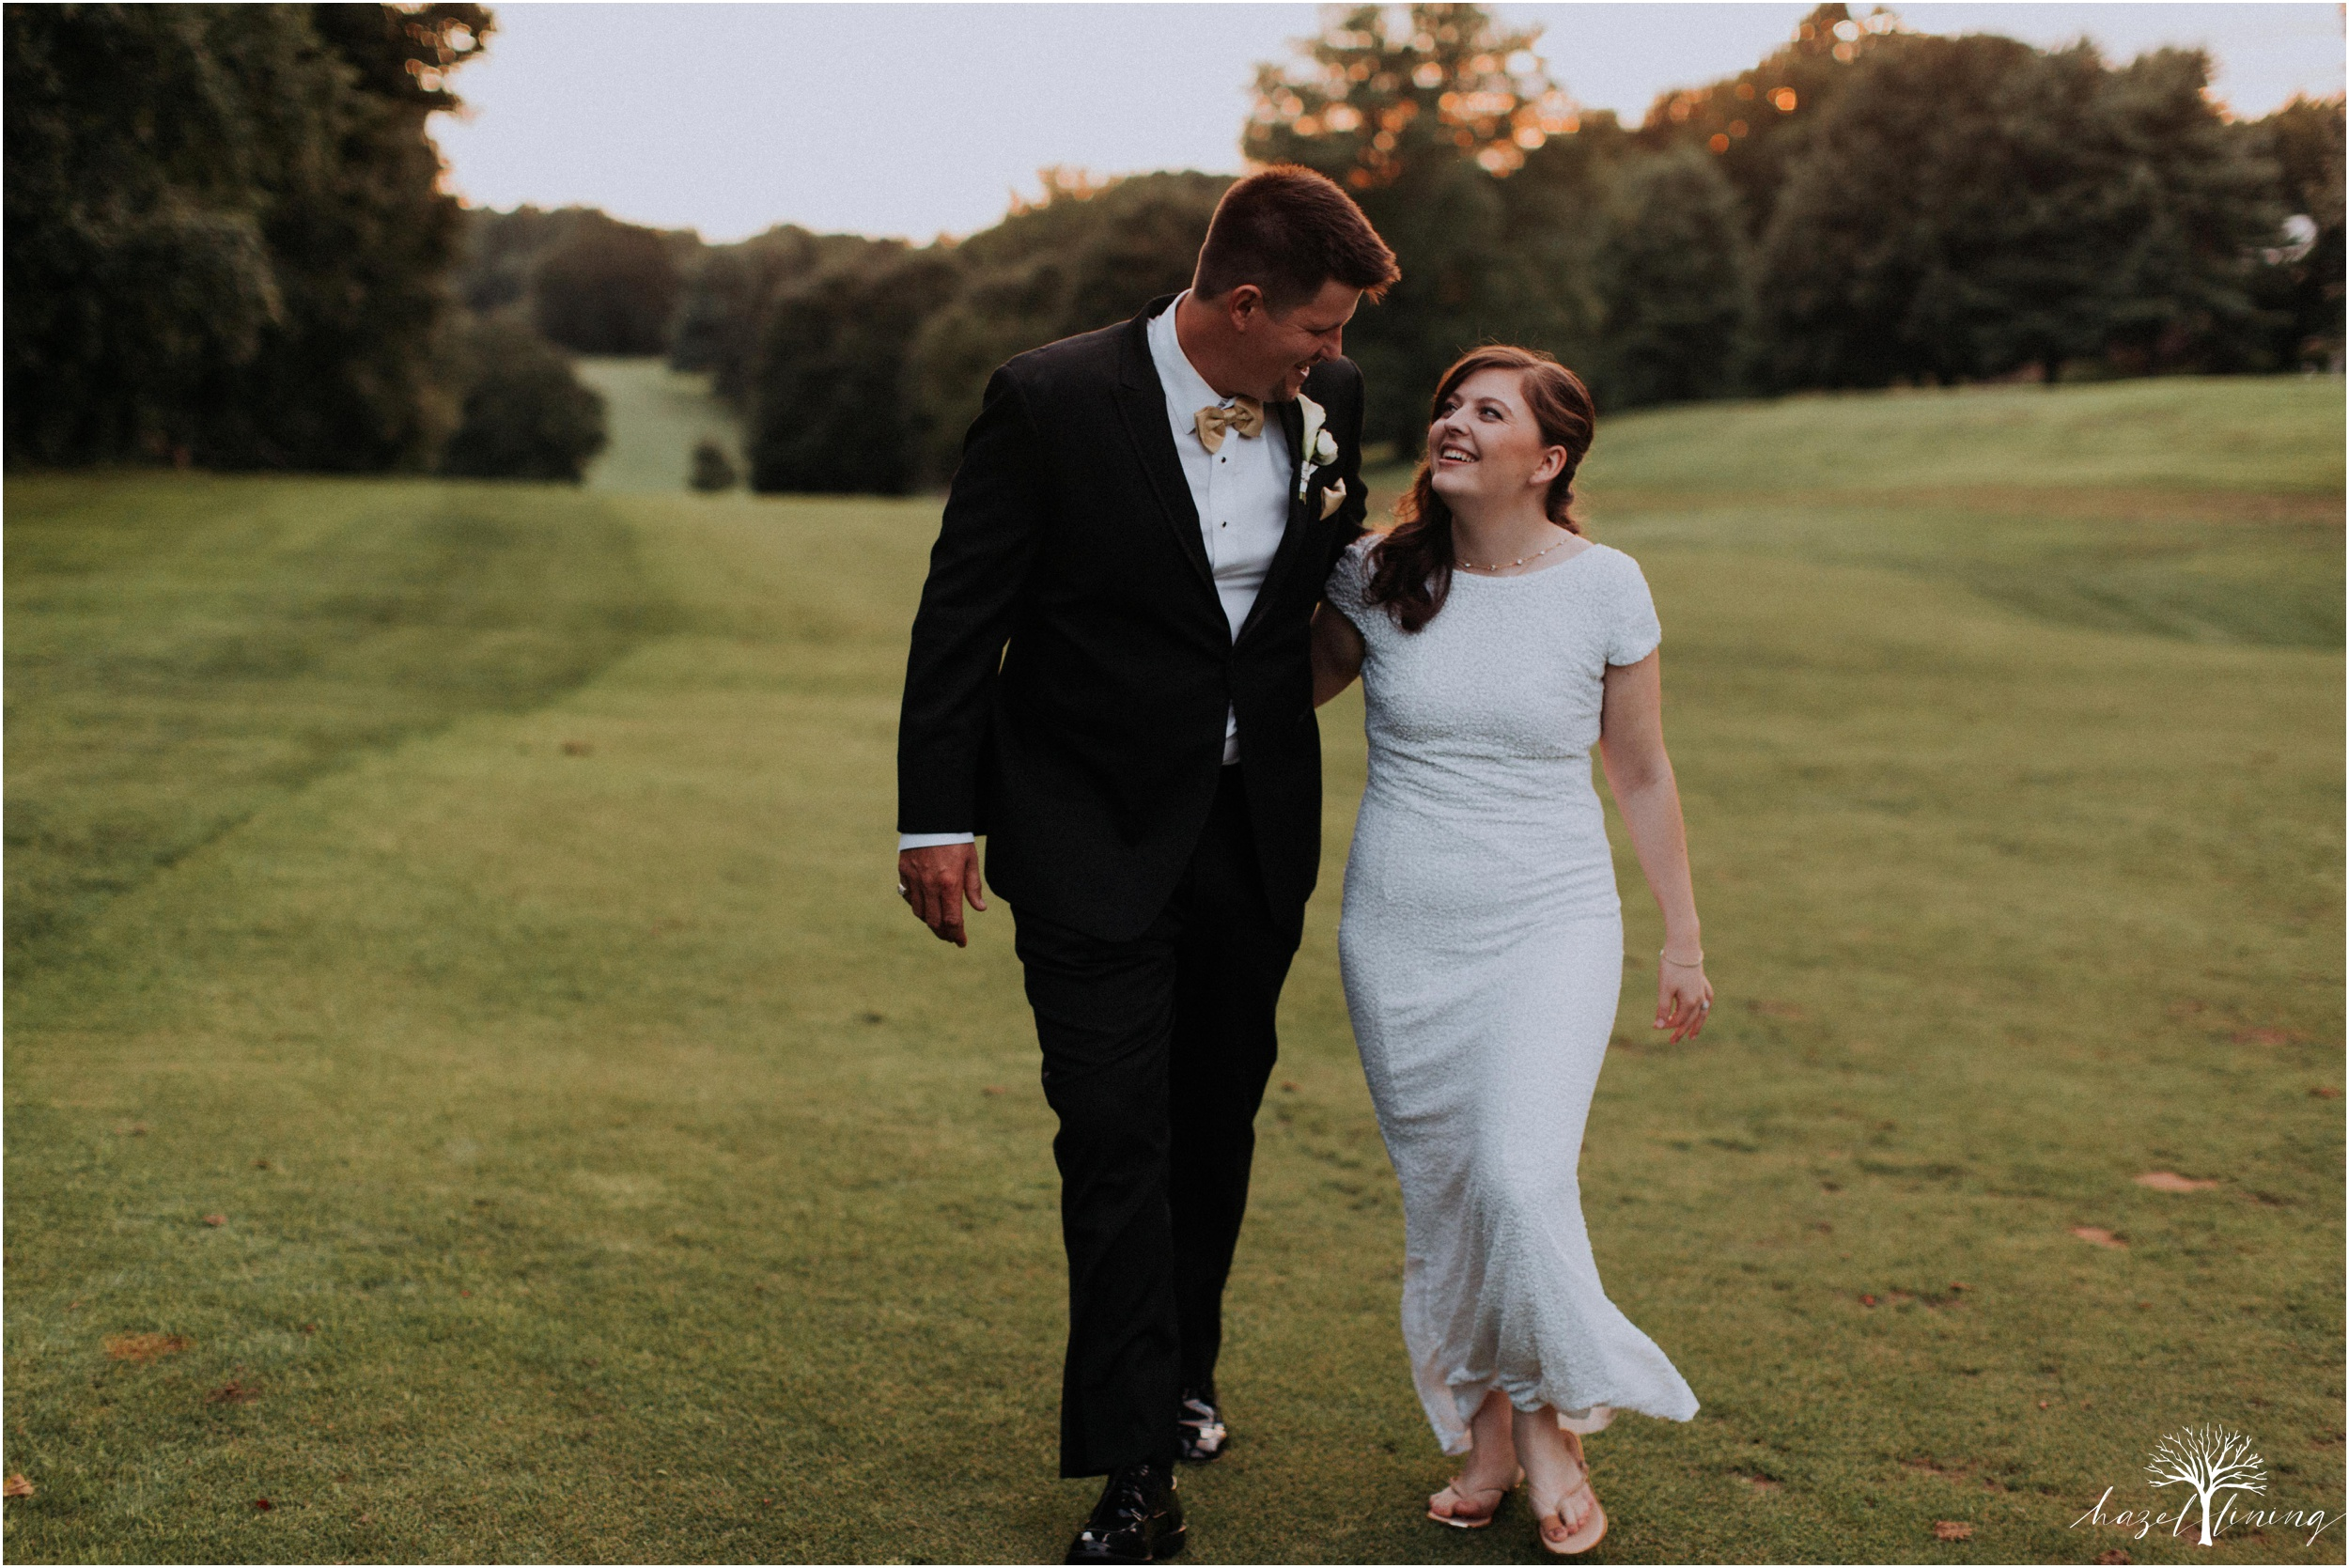 elizabeth-doelp-andrew-foreback-middletown-country-club-summer-langhorne-pennsylvania-wedding-hazel-lining-travel-wedding-elopement-photography_0183.jpg